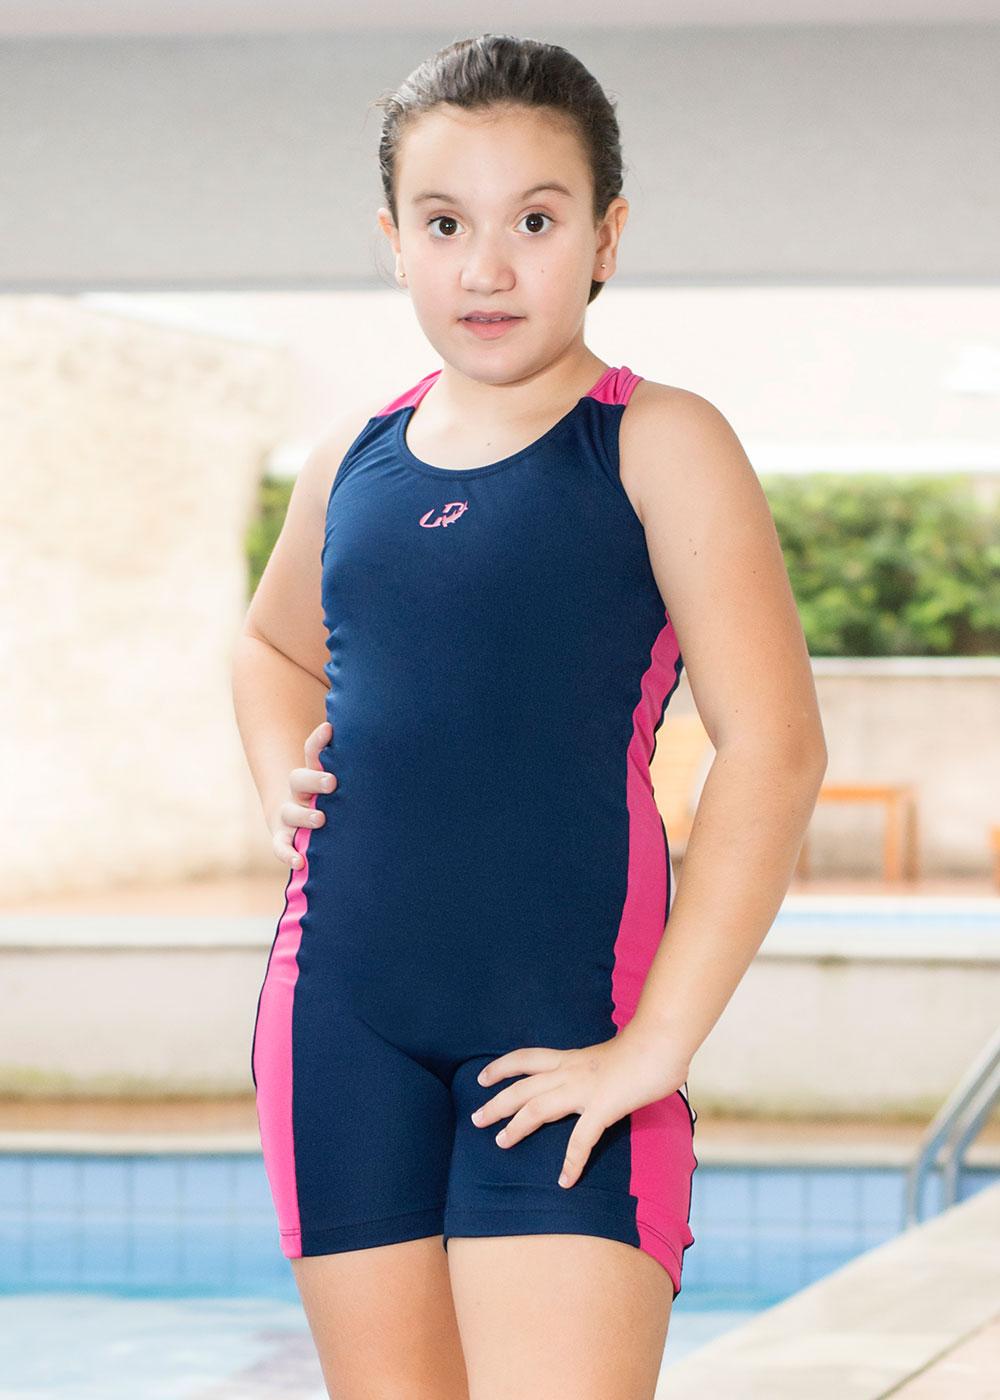 MACAQUINHO KIDS HELANCA GIRLS HAMMERHEAD - MARINHO/PINK FLÚOR